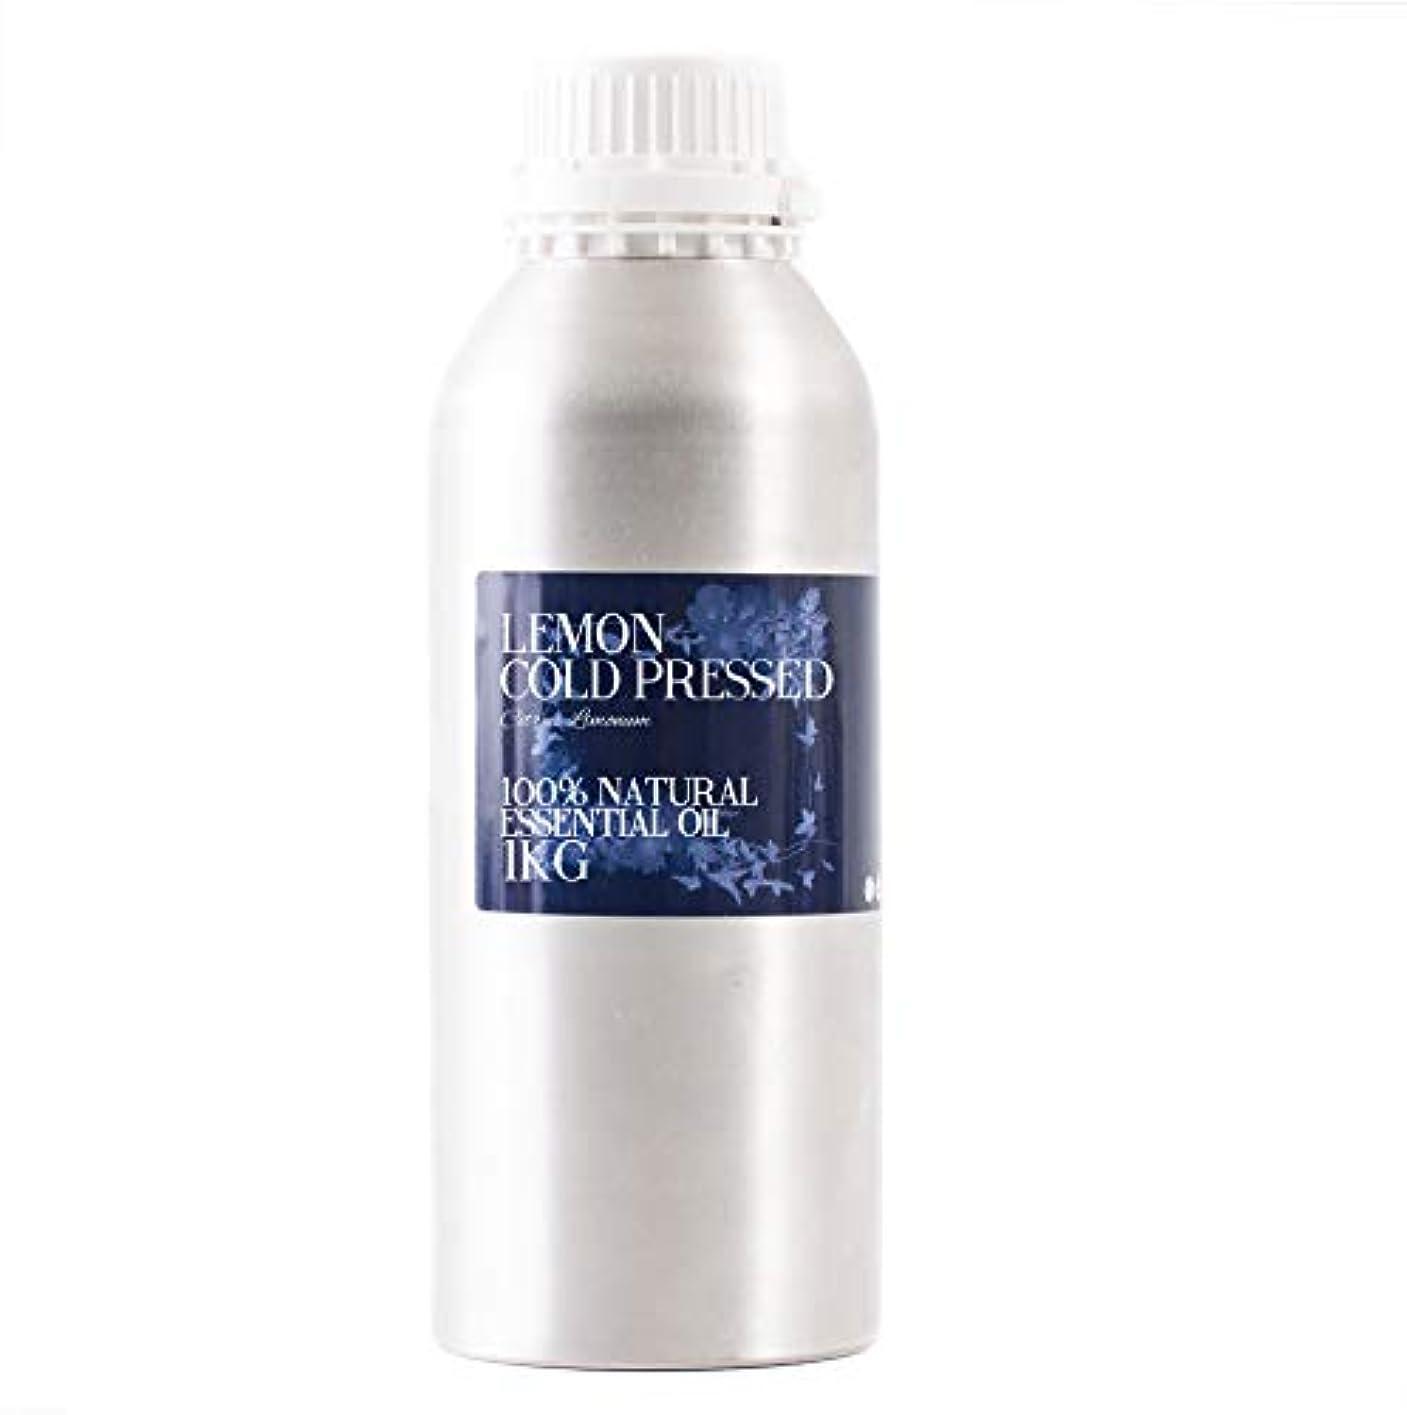 Mystic Moments | Lemon Cold Pressed Essential Oil - 1Kg - 100% Natural